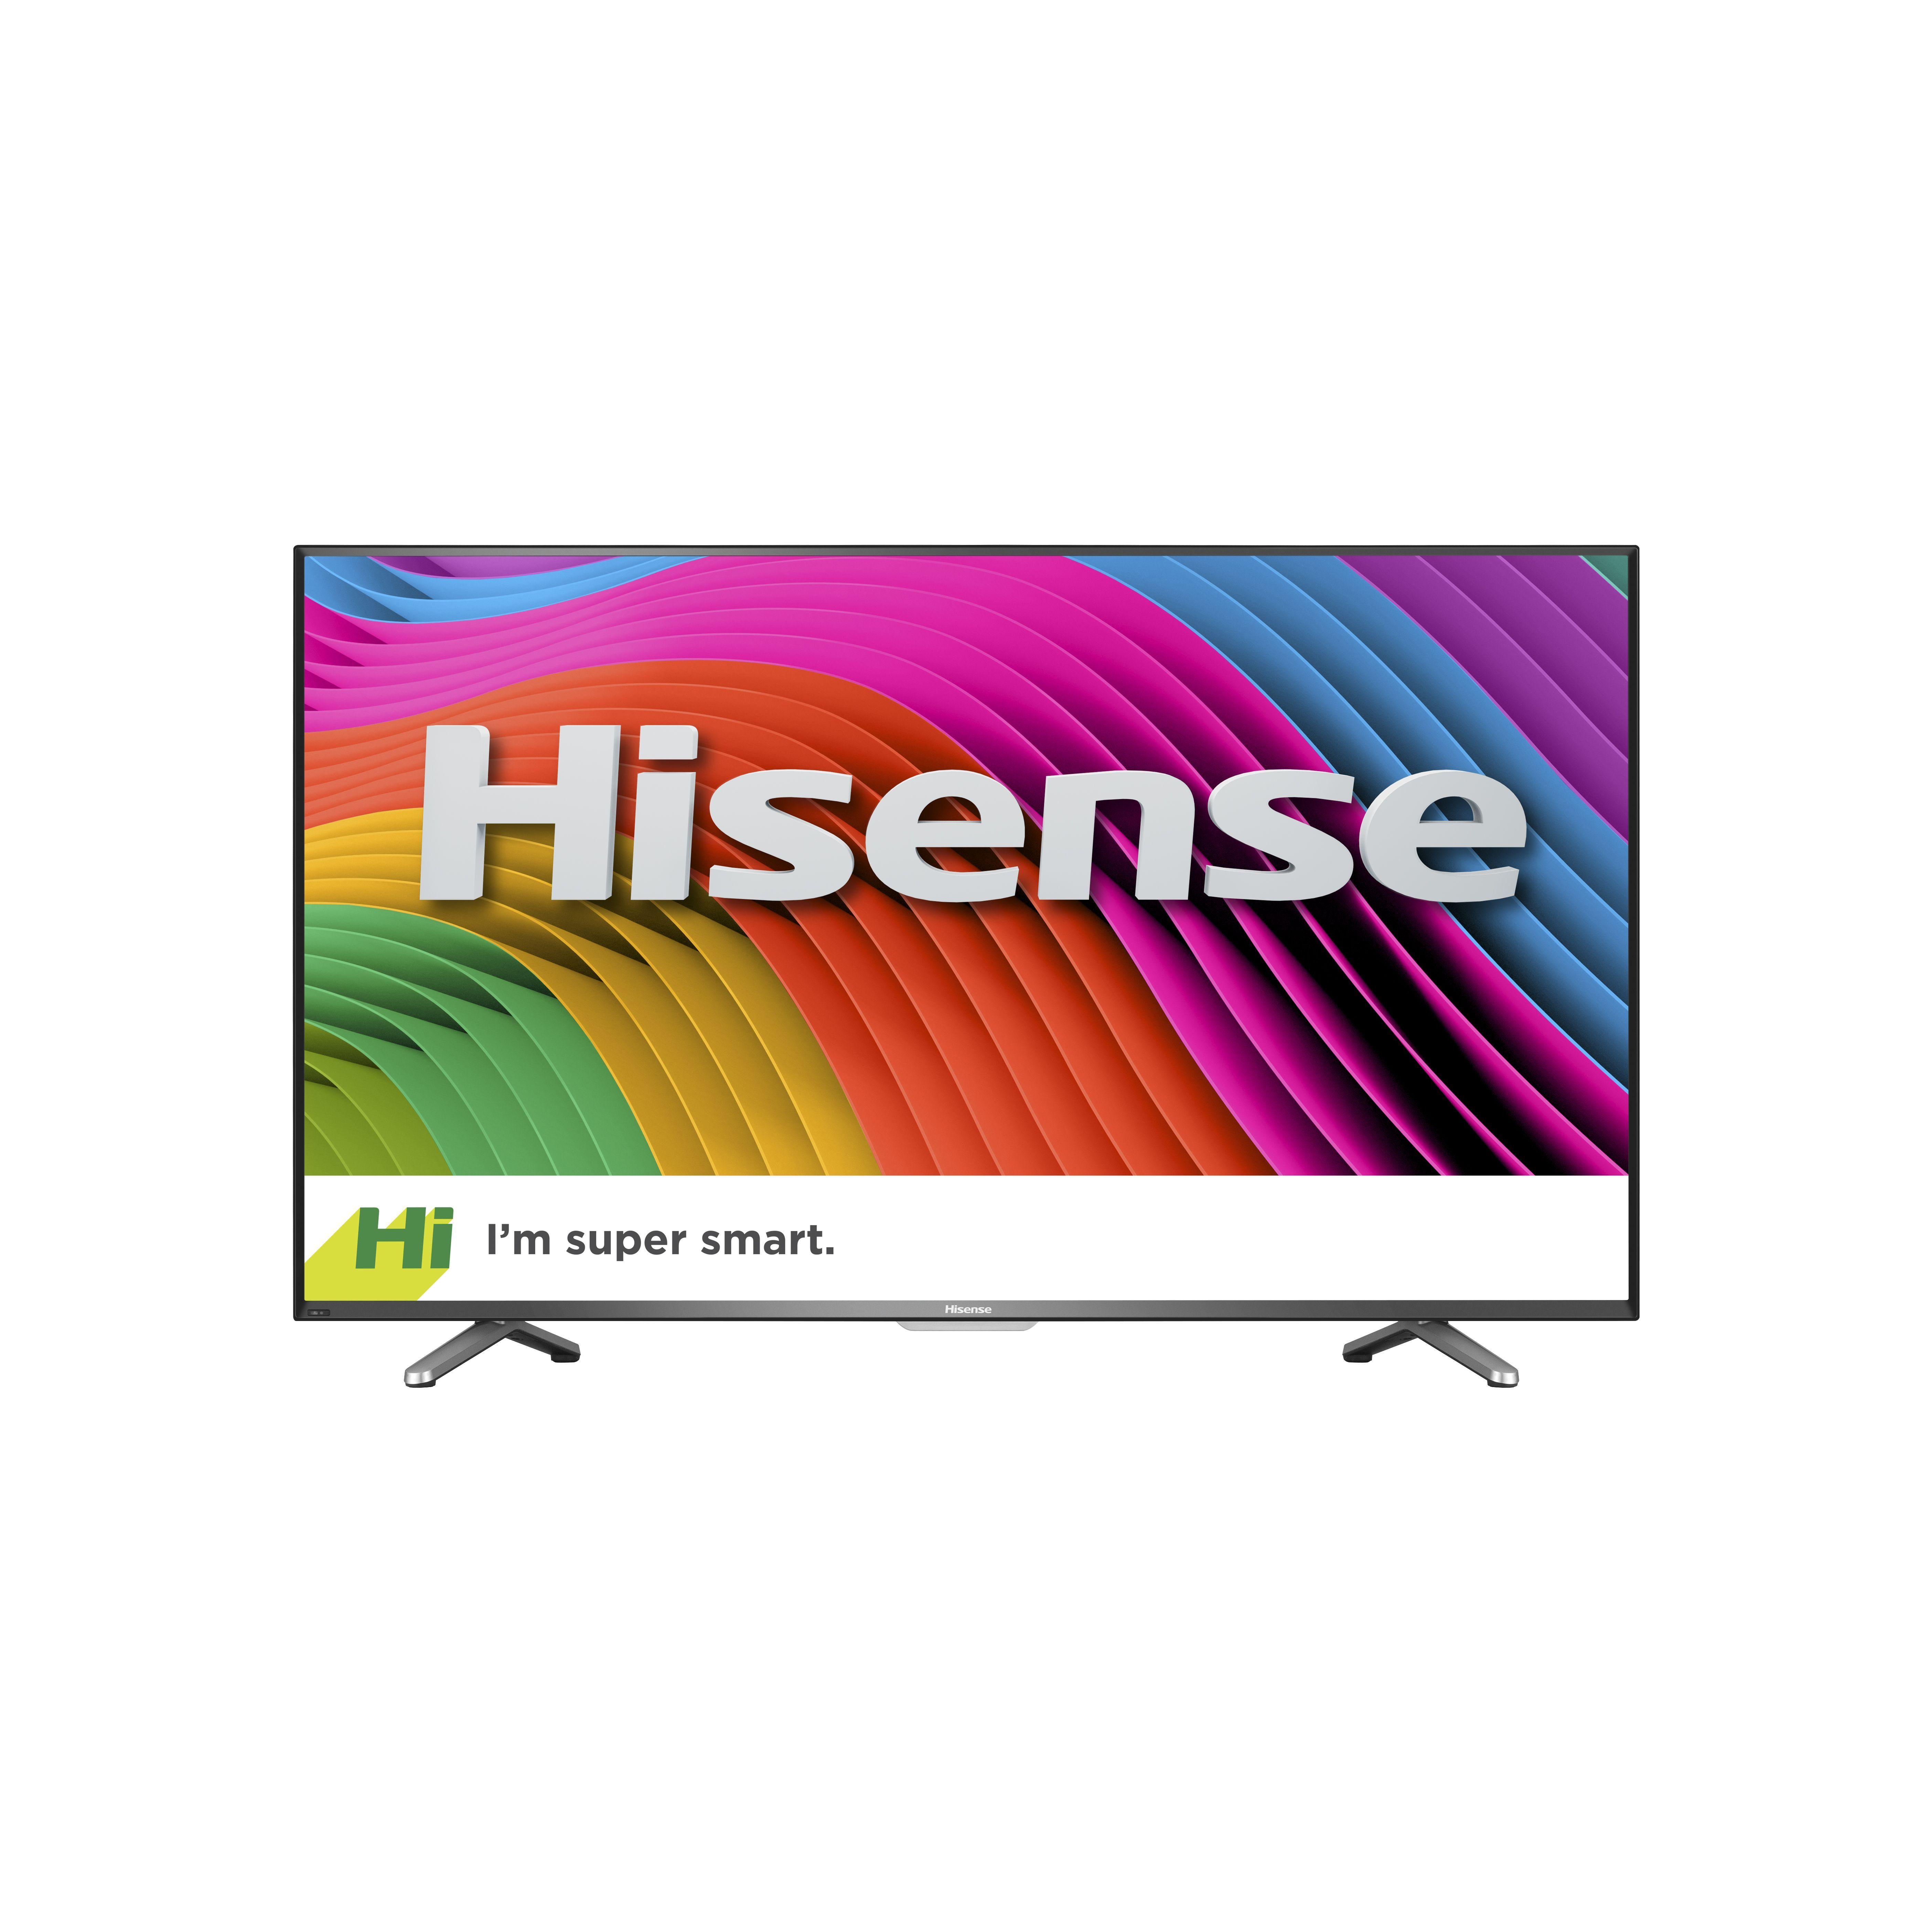 Hisense 43 4k ultra hd smart tv black with images